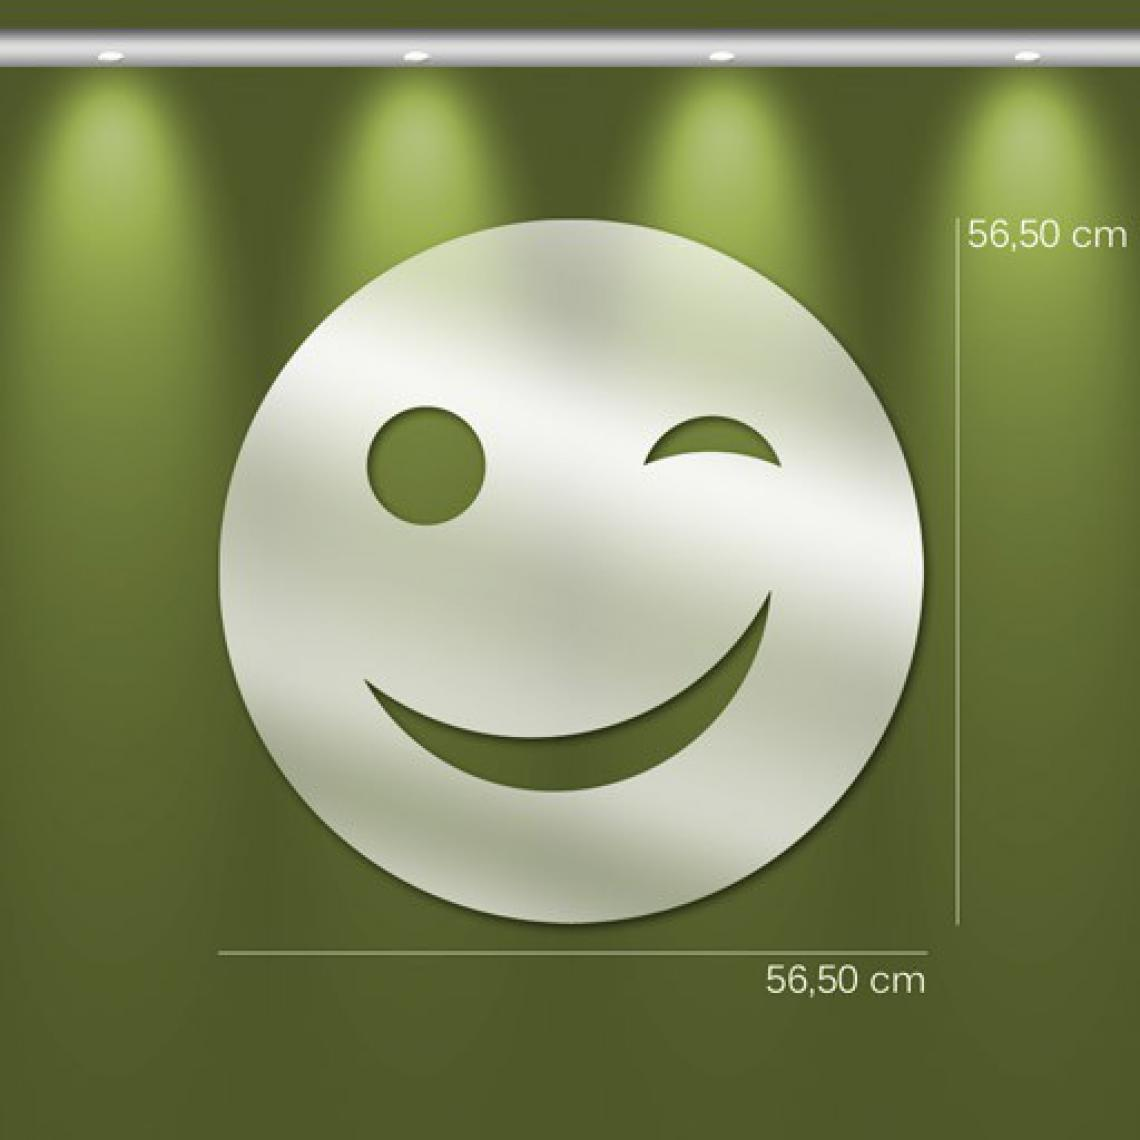 Miroir smiley